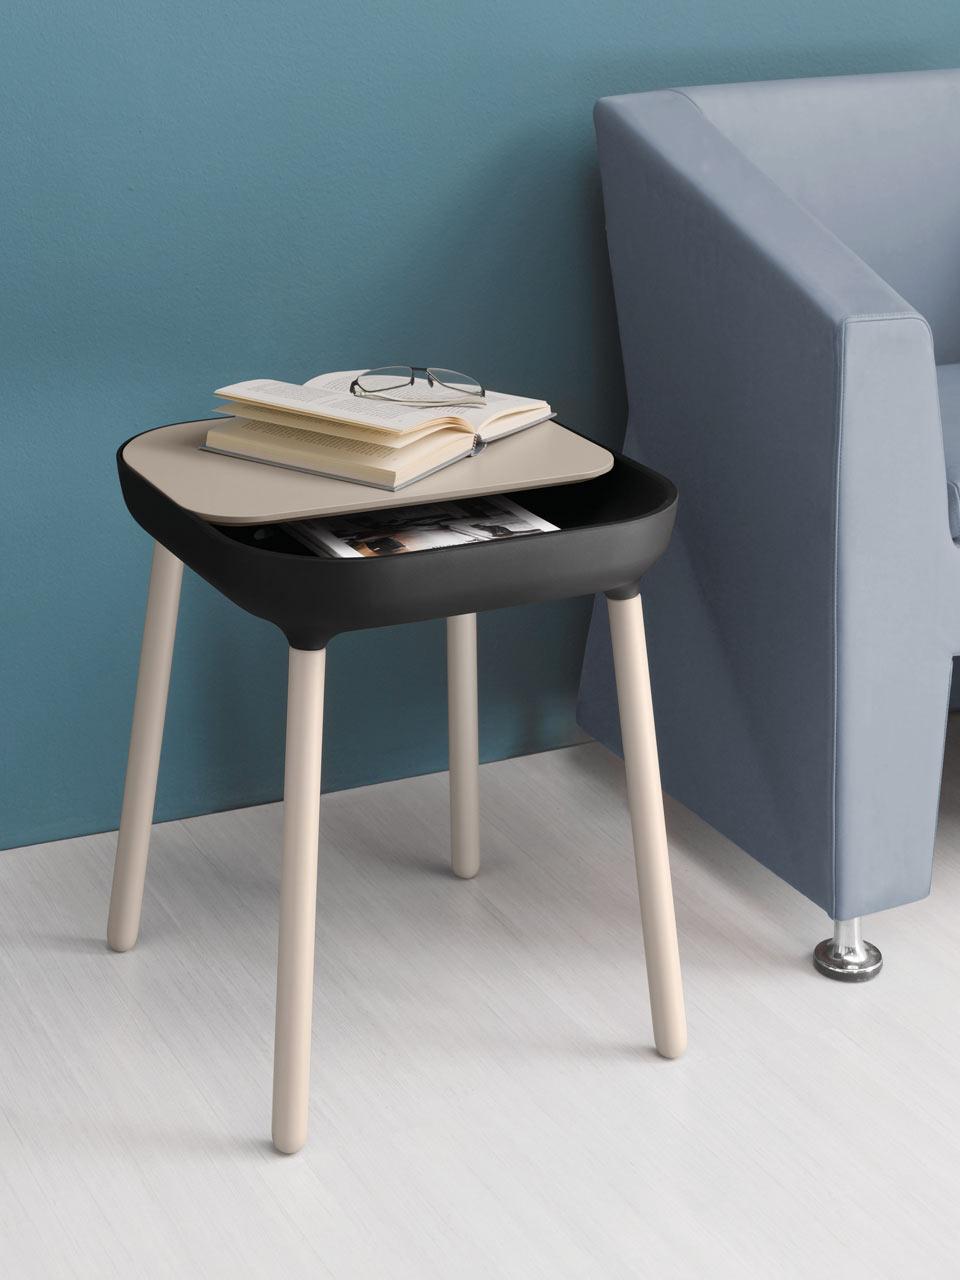 App-Side-Table-hisheji (3)